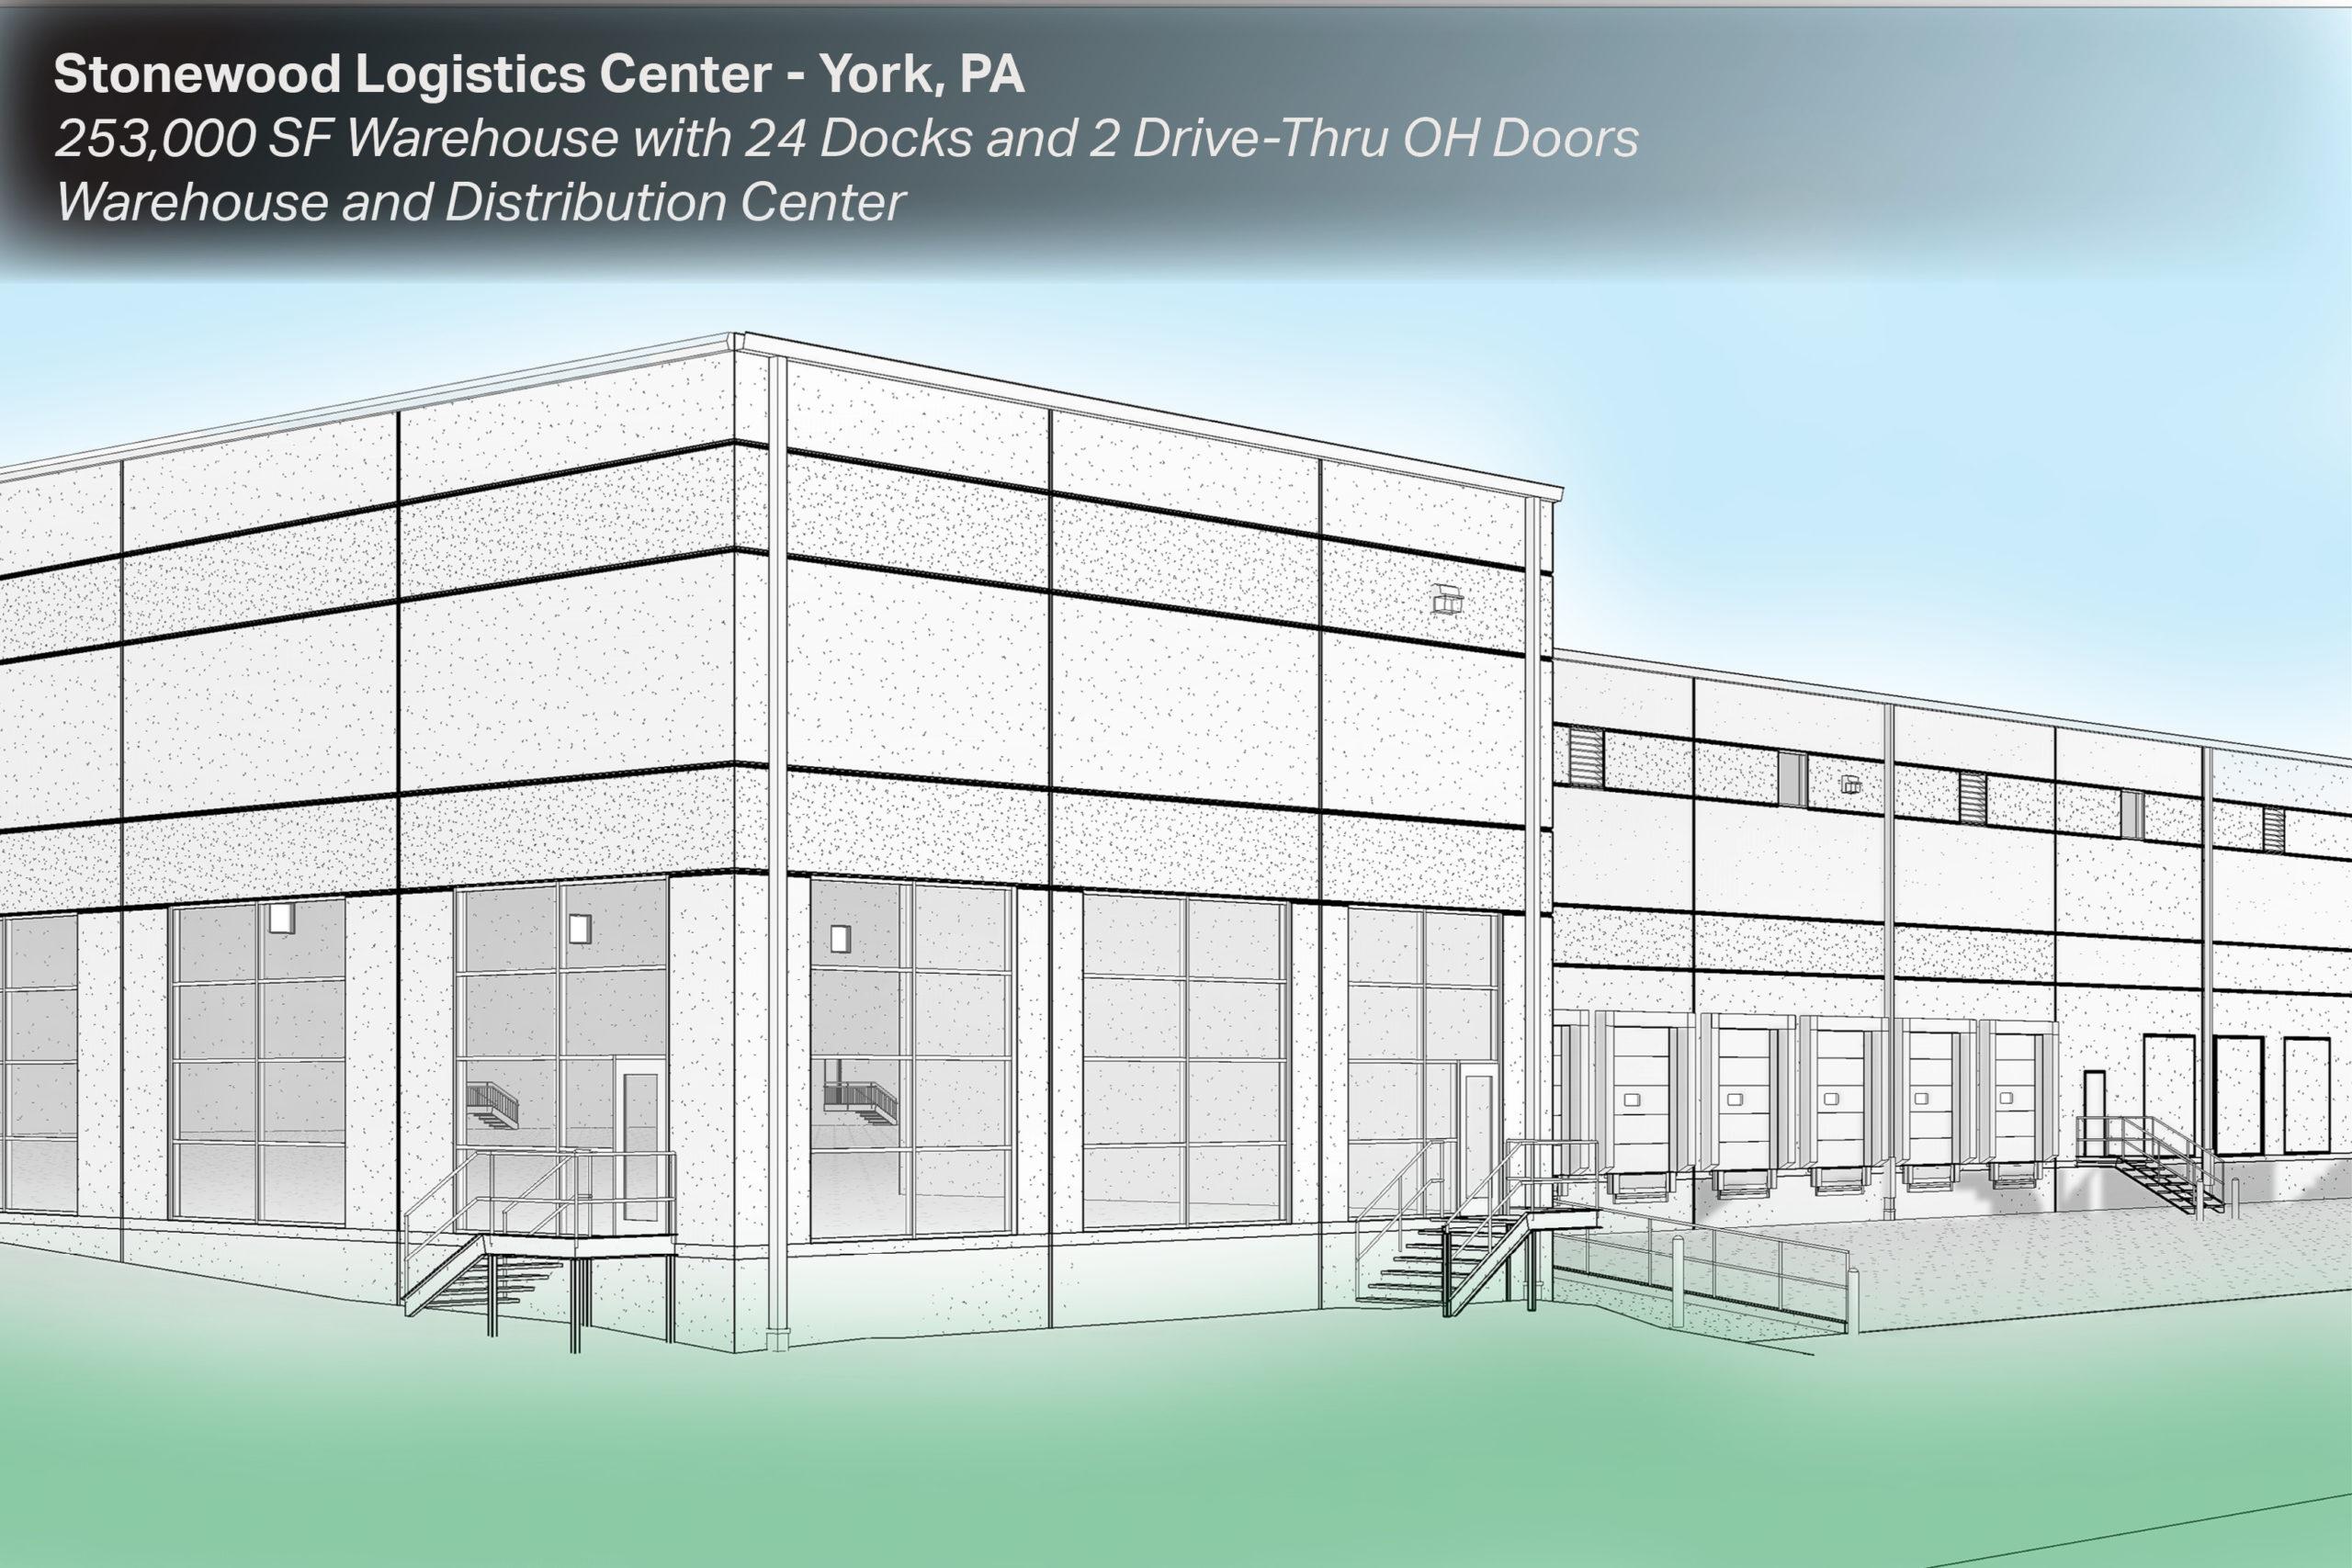 Warehouse/Distribution Centers